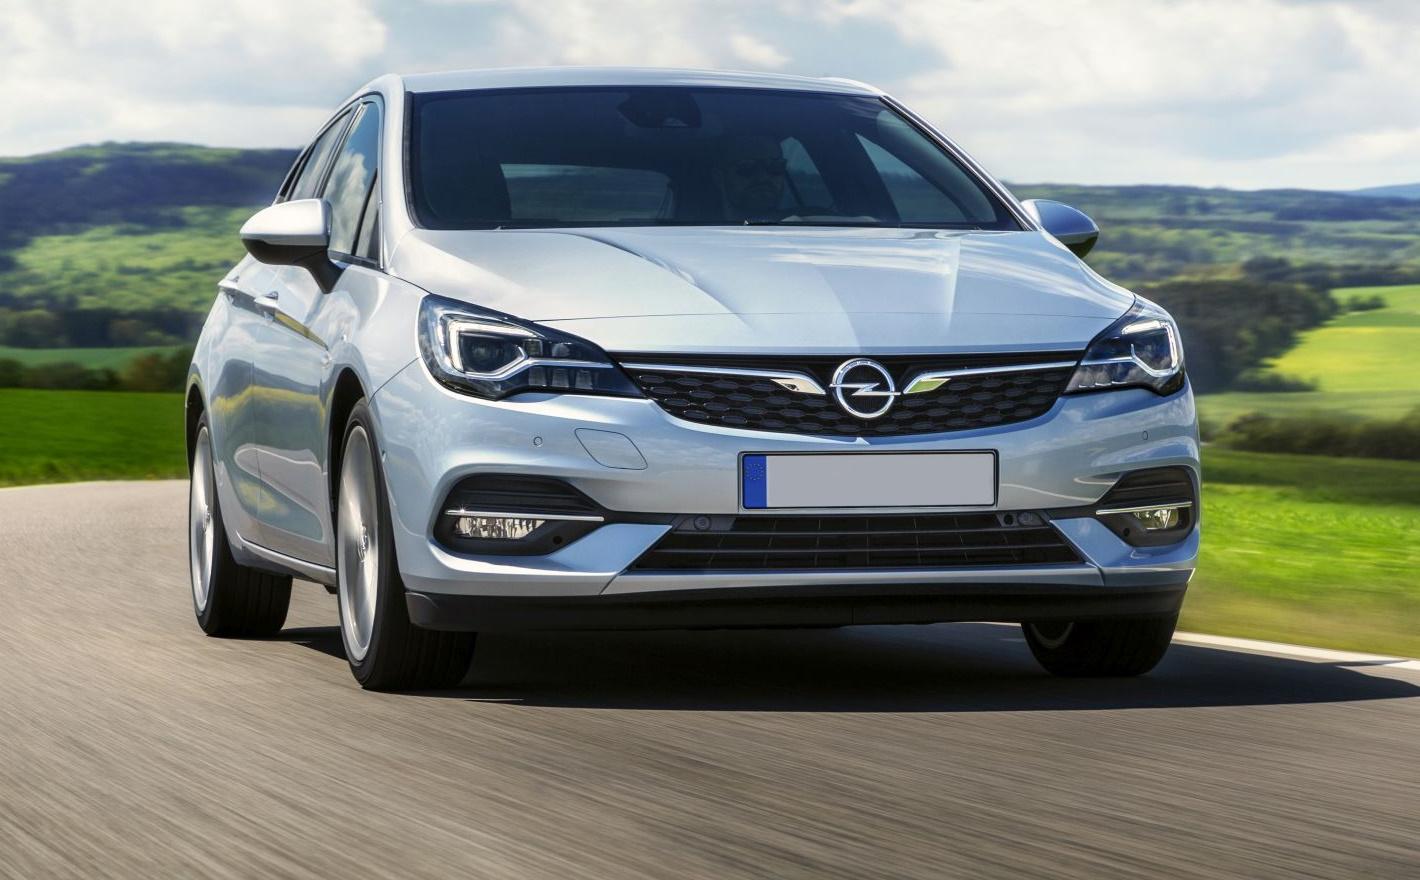 OPEL Astra K Edition Hatchback 1.2 Turbo Benzina : Opel Astra Edition